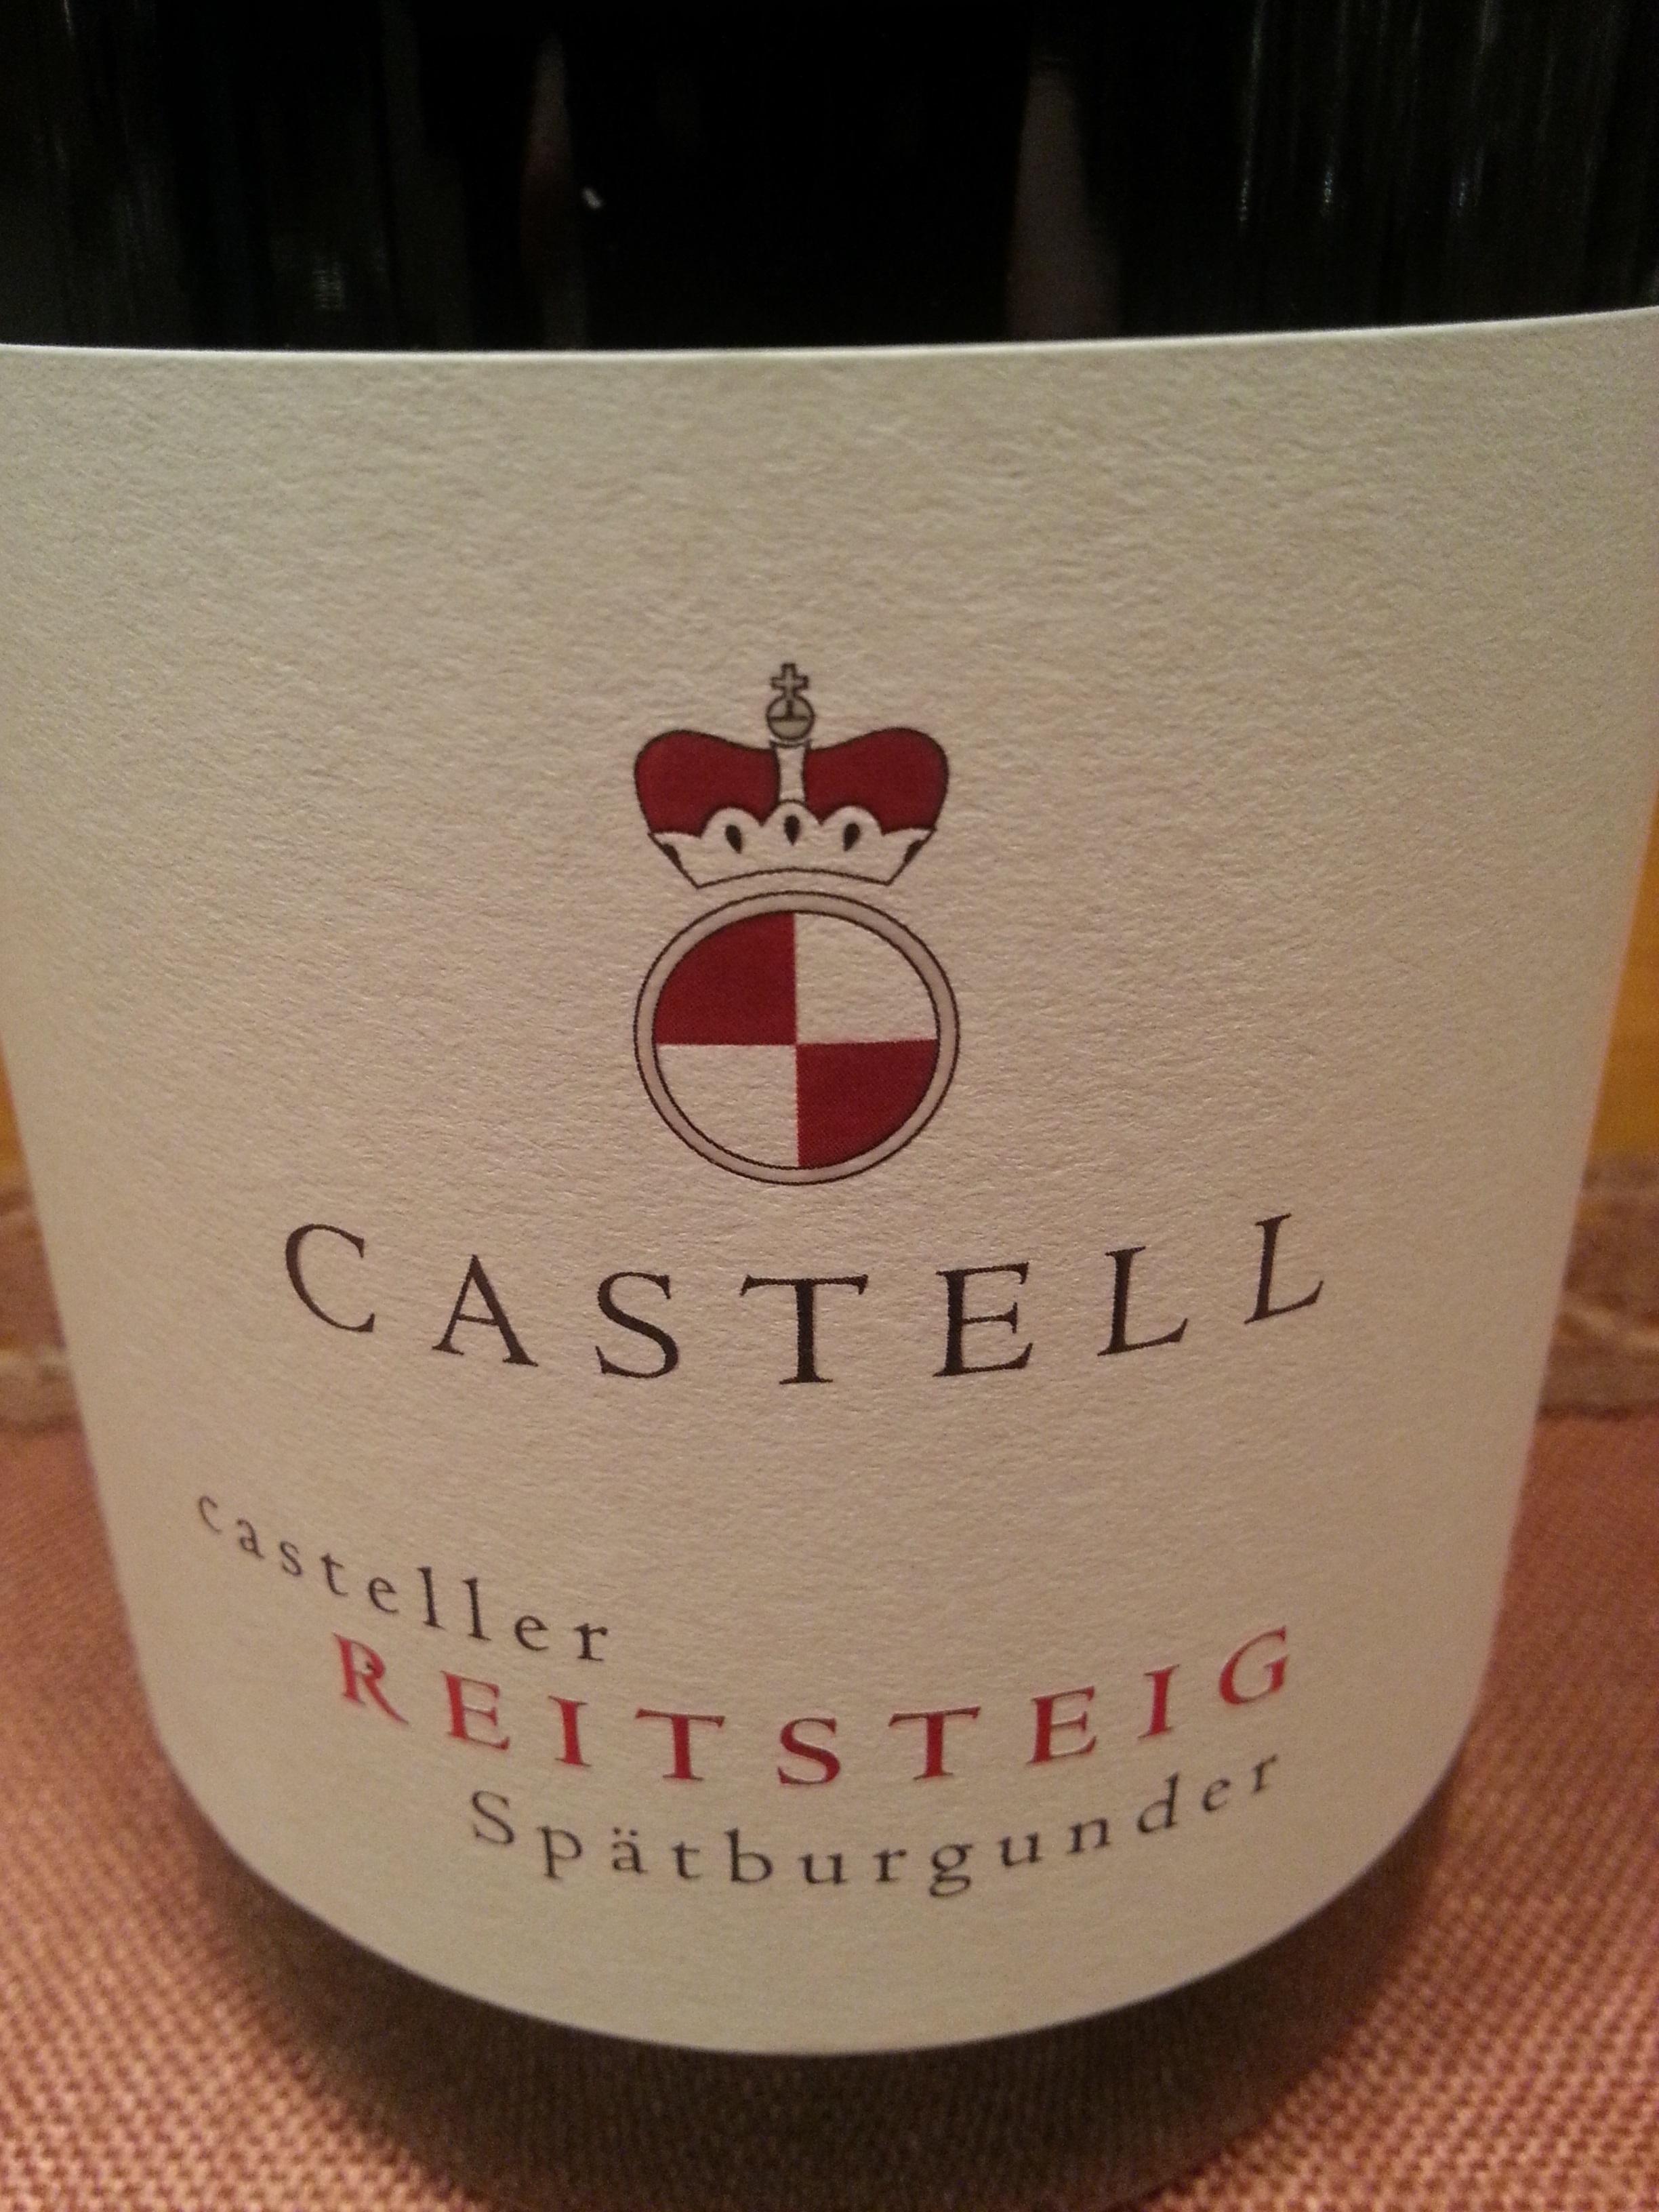 2014 Spätburgunder Reitsteg | Castell